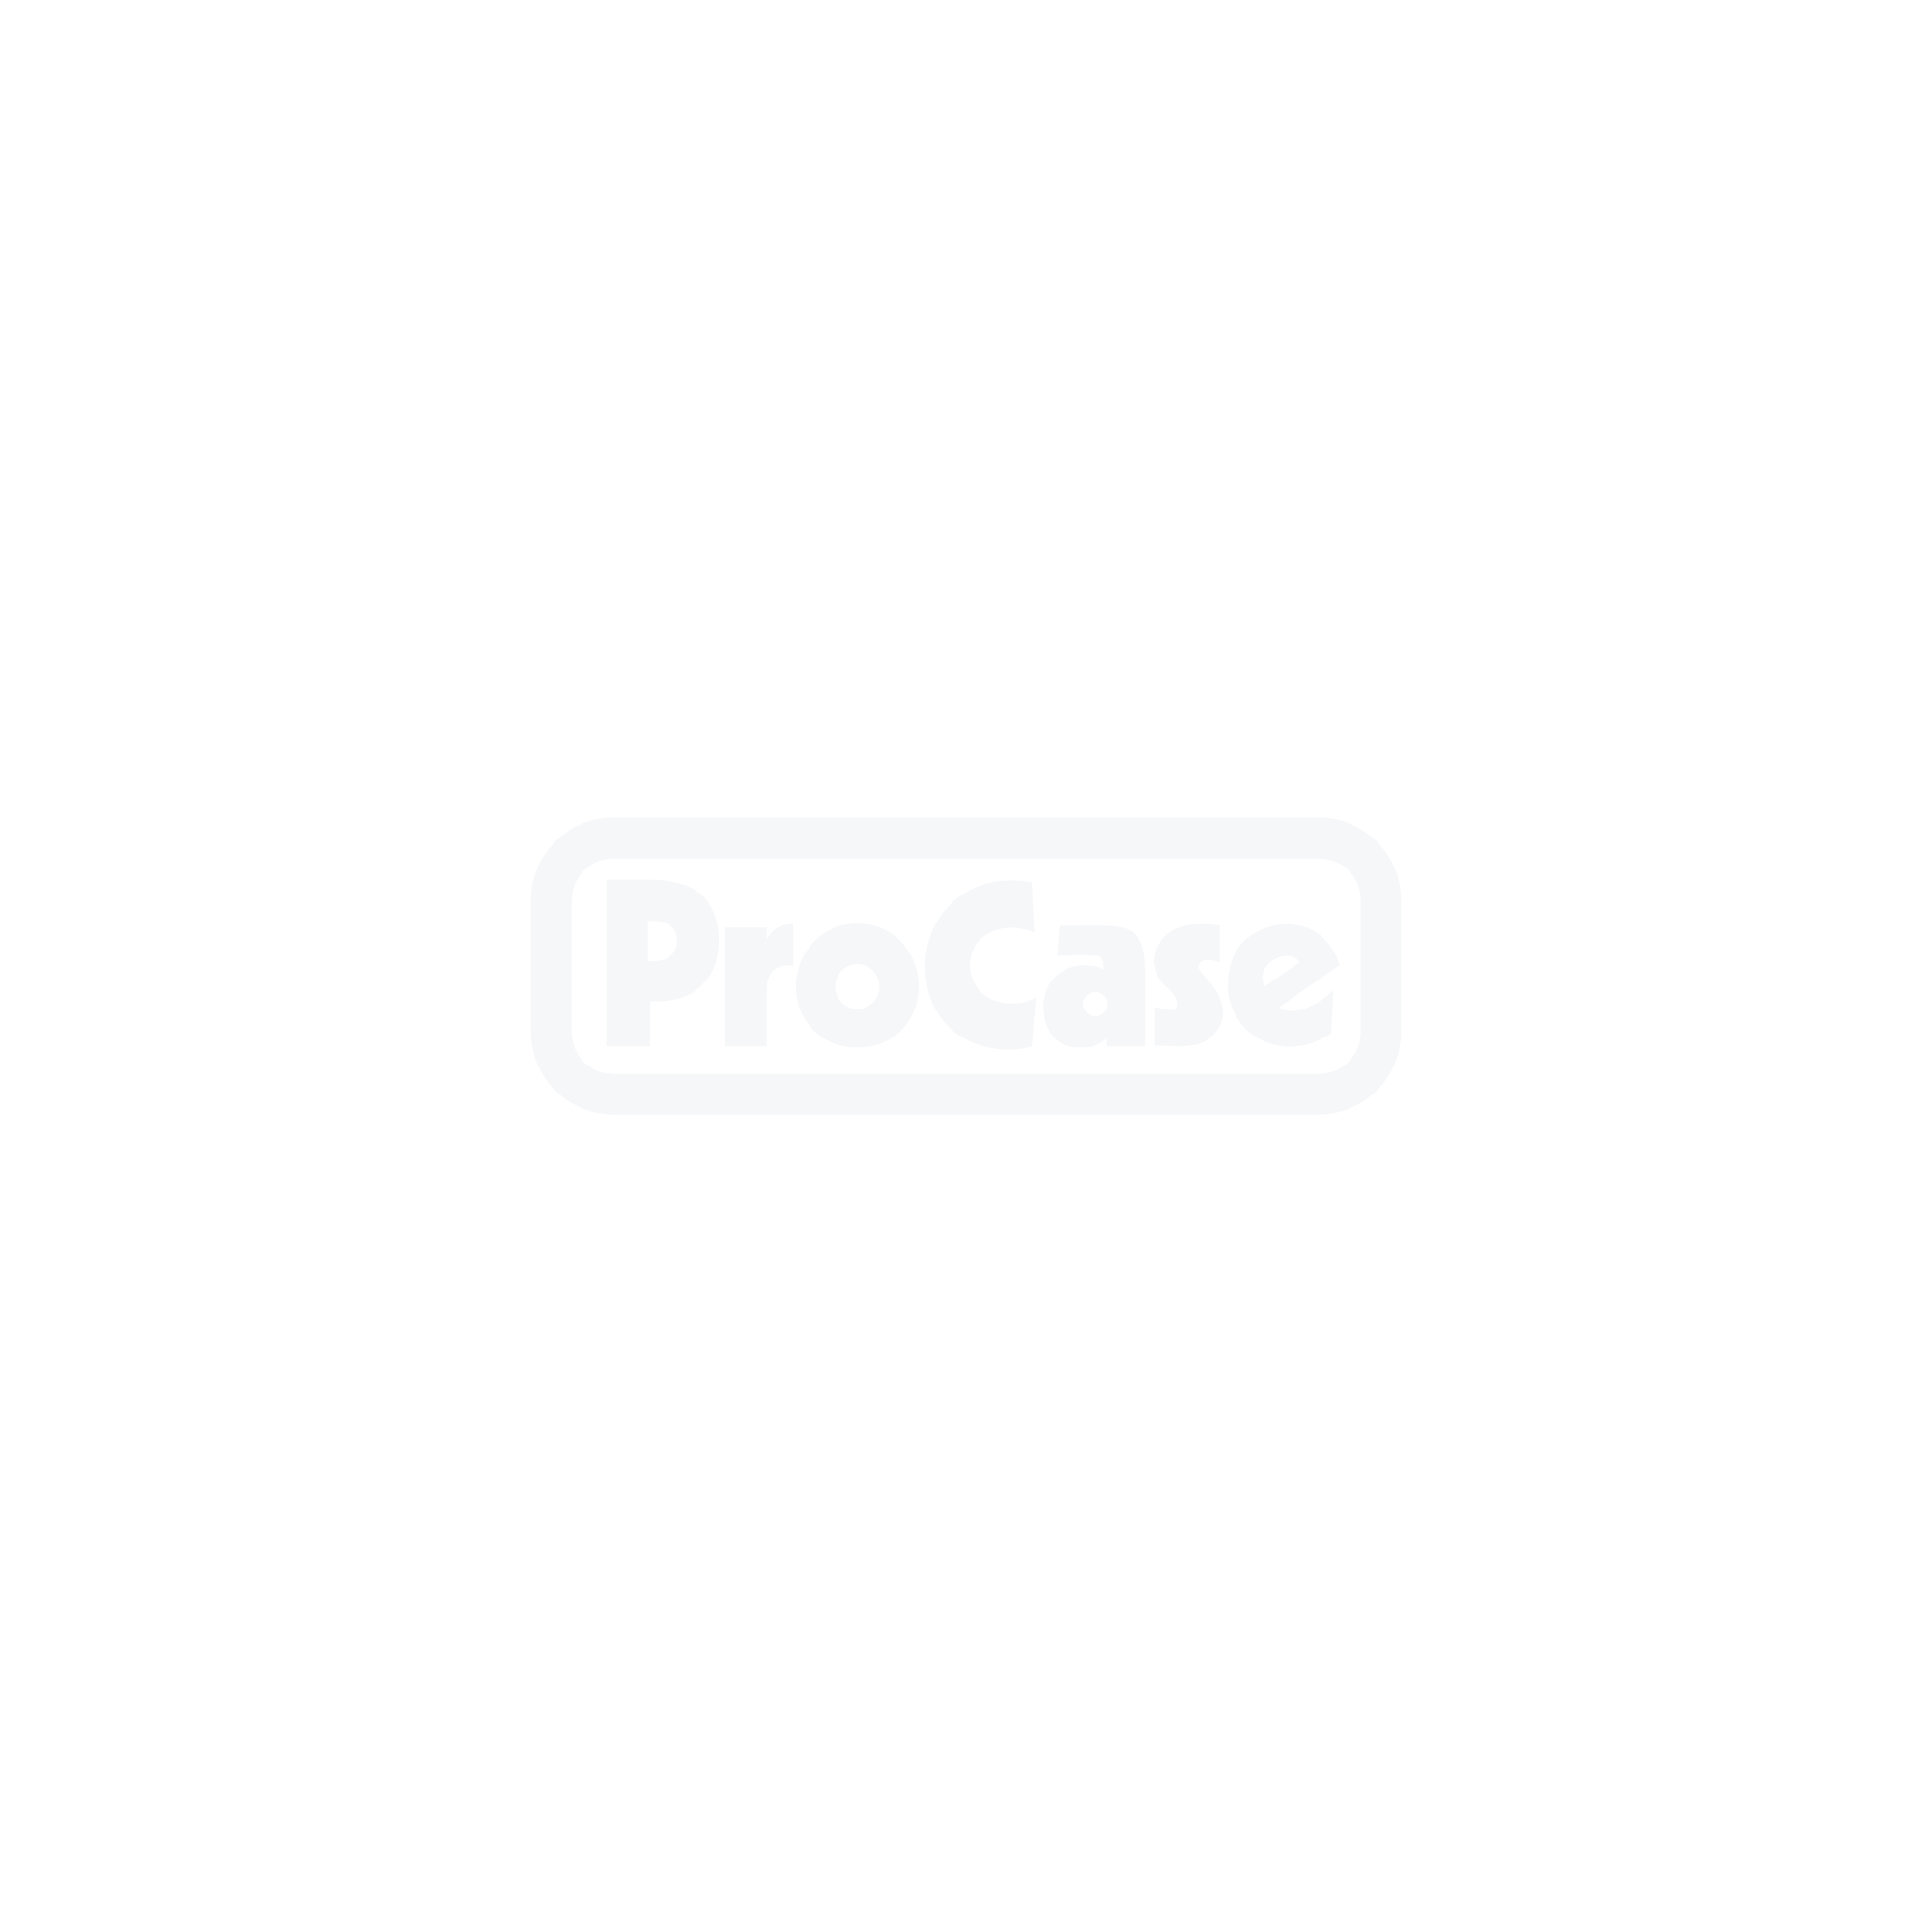 QSD Doppelrack 2x 12HE 600 mm tief